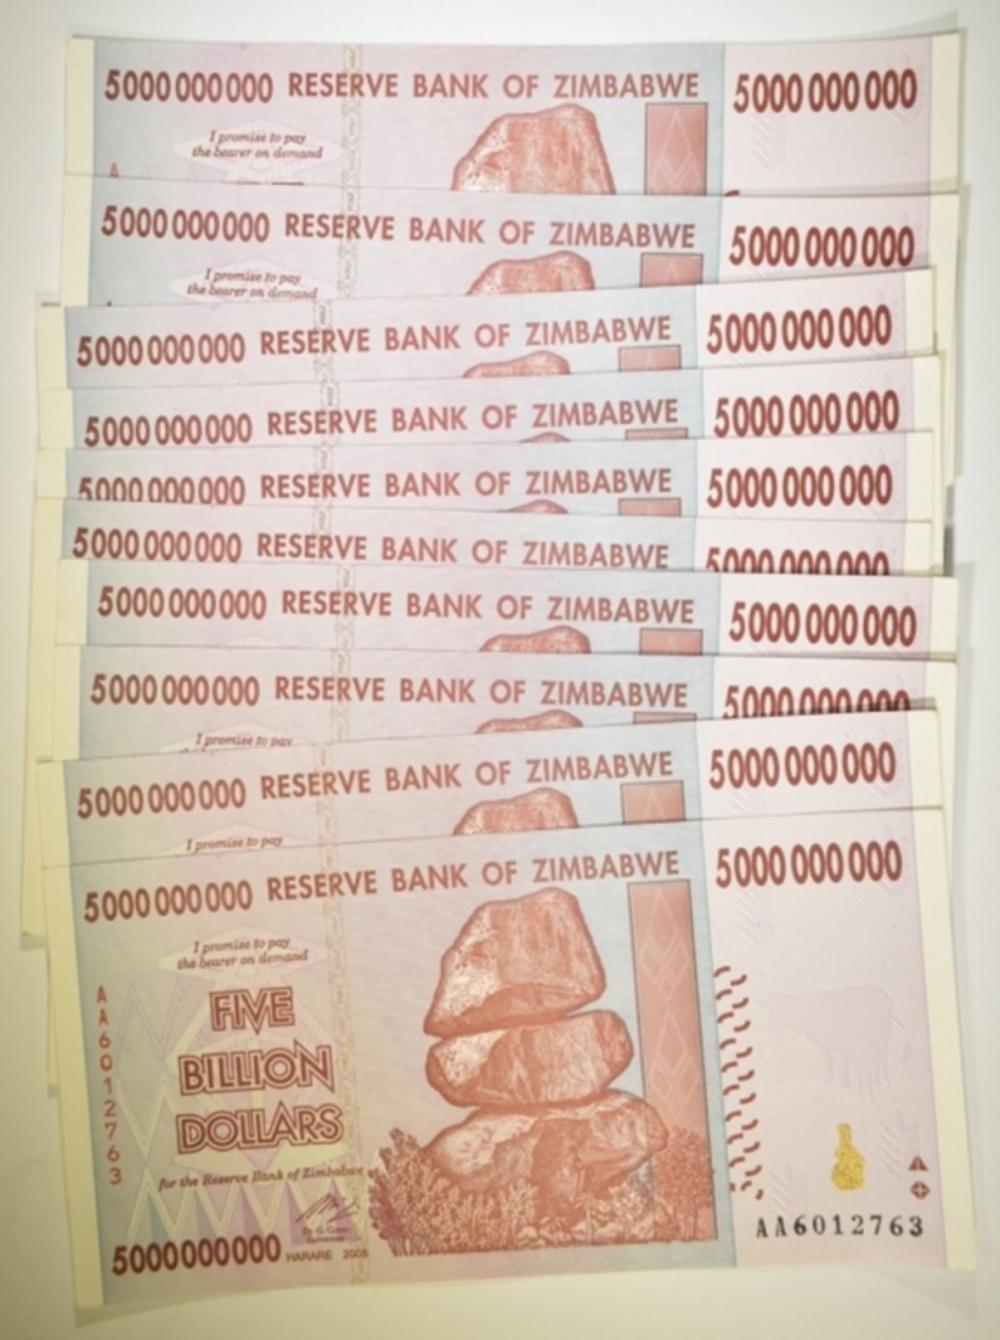 10-CU BANK OF ZIMBABWE 5 BILLION DOLLAR NOTES